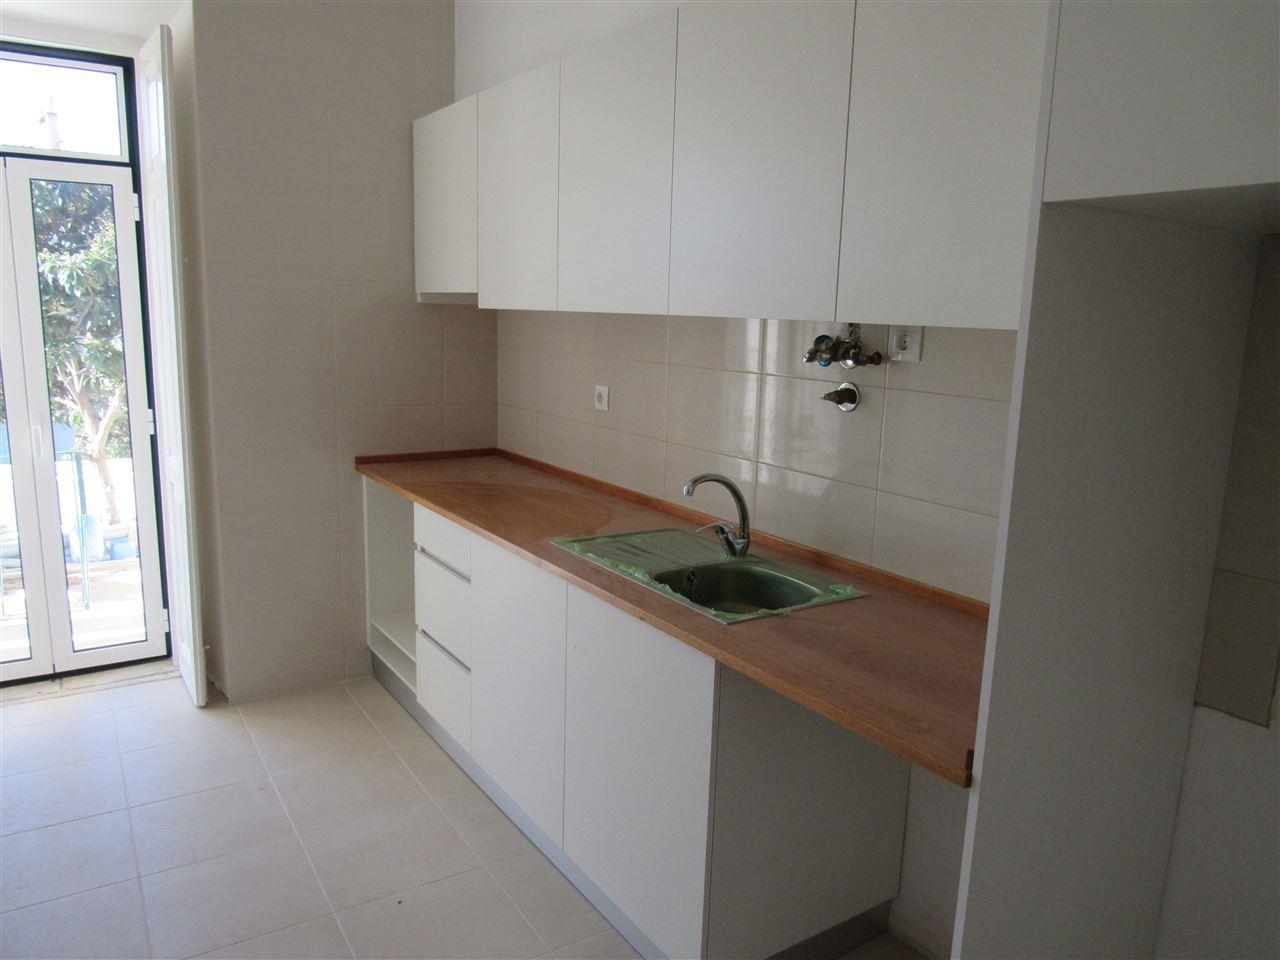 Apartment for Sale at Flat, 5 bedrooms, for Sale Lisboa, Lisboa, 1069-157 Portugal